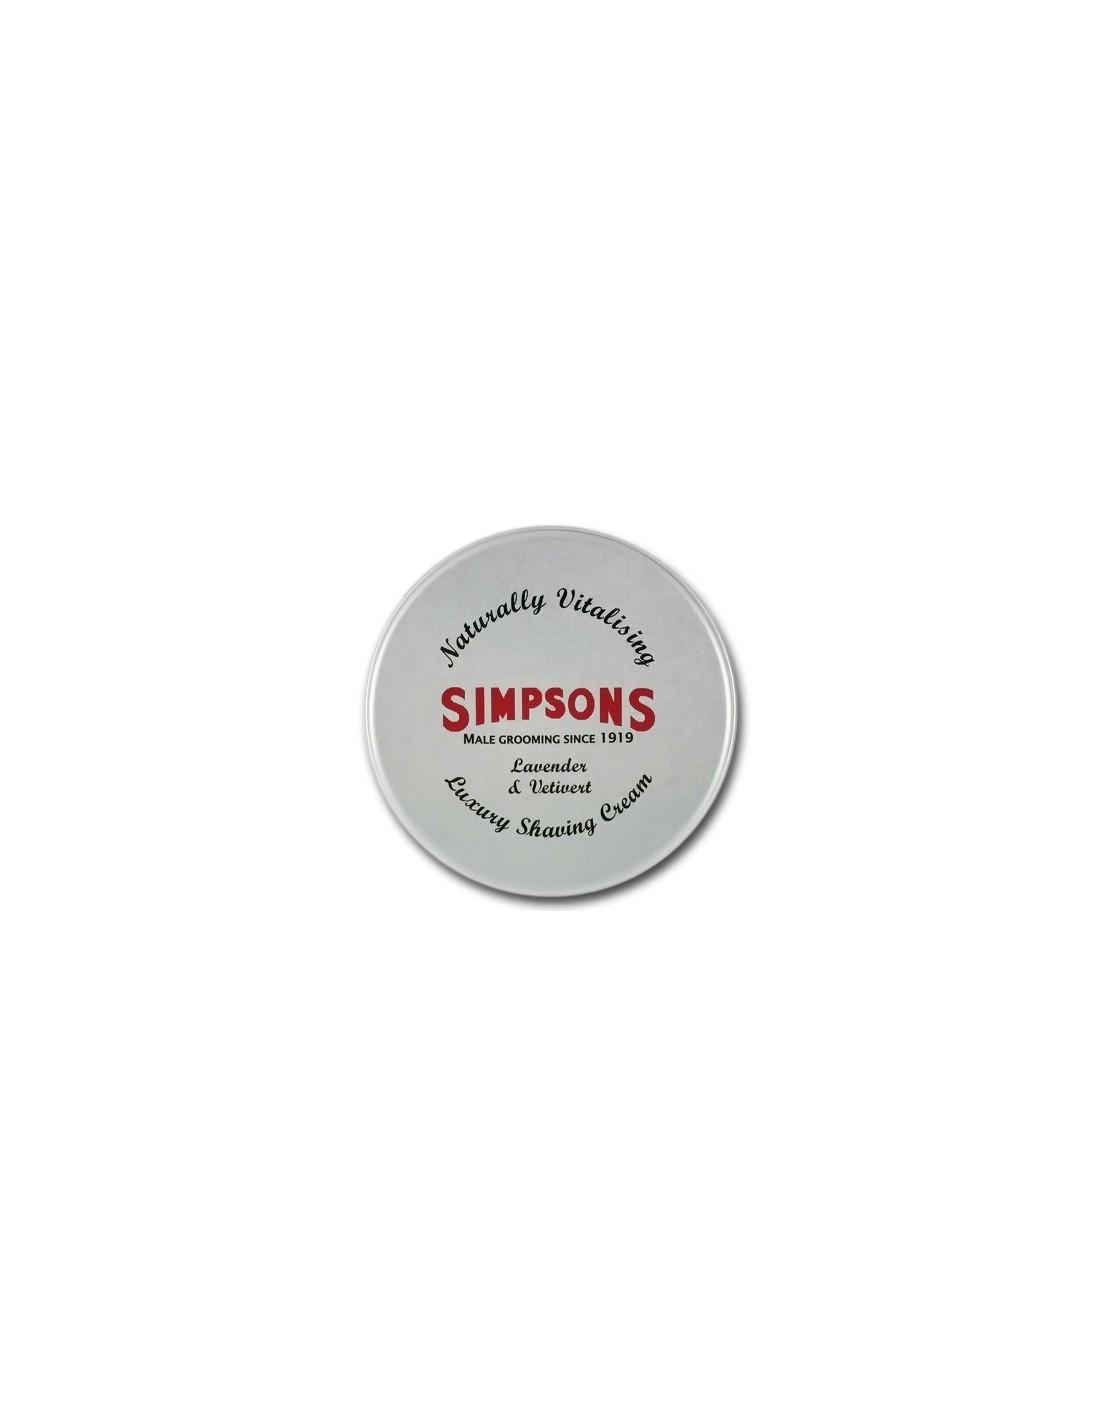 Simpson Shaving Cream Lavender   Vetiver 125ml  82a74437a60